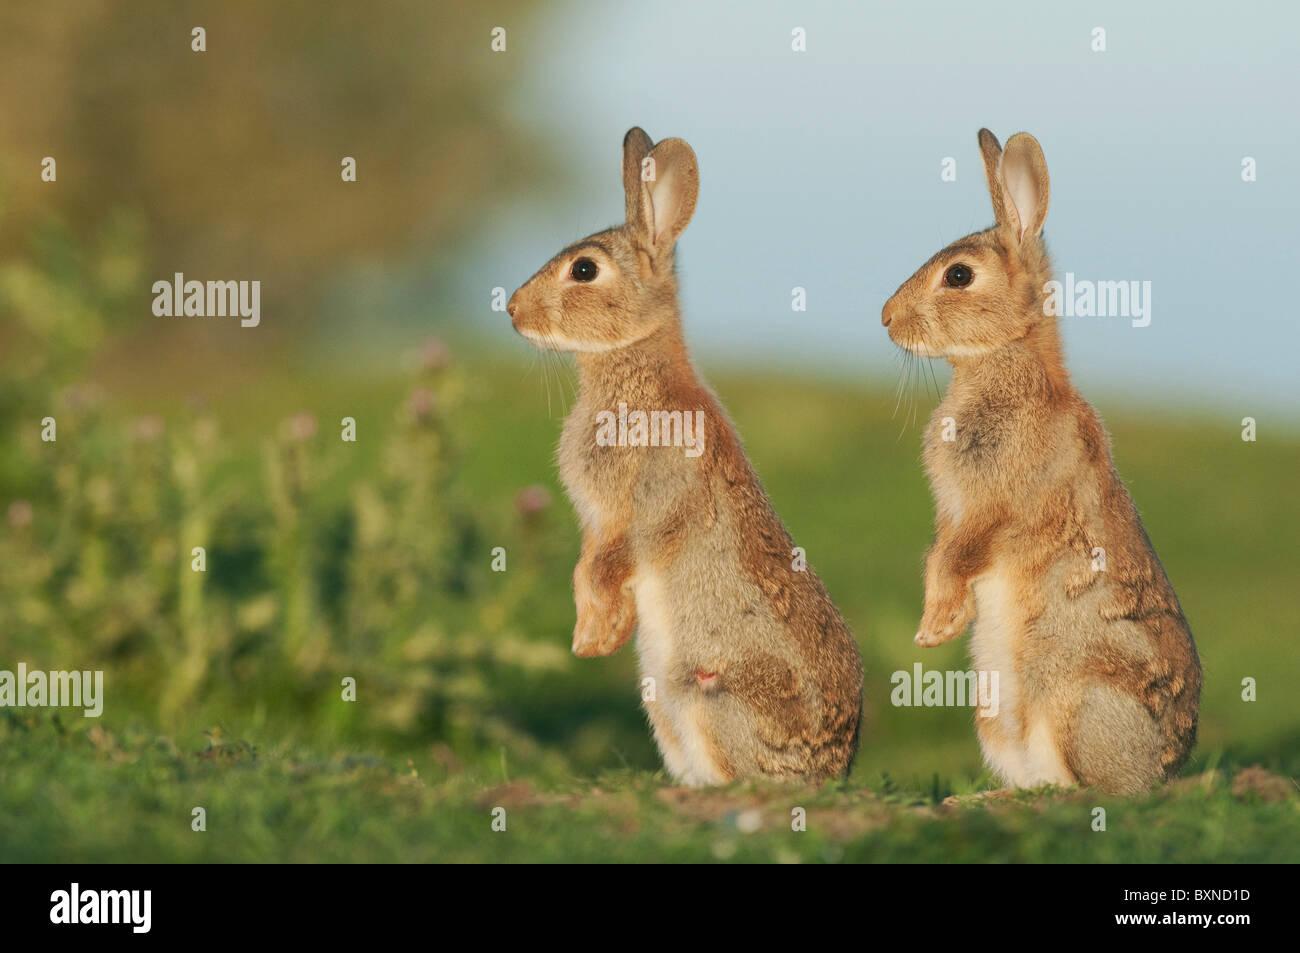 Coniglio europeo (oryctolagus cuniculus). Due giovani avviso in serata la luce solare, Nord paludi Kent, Kent, Inghilterra. Immagini Stock